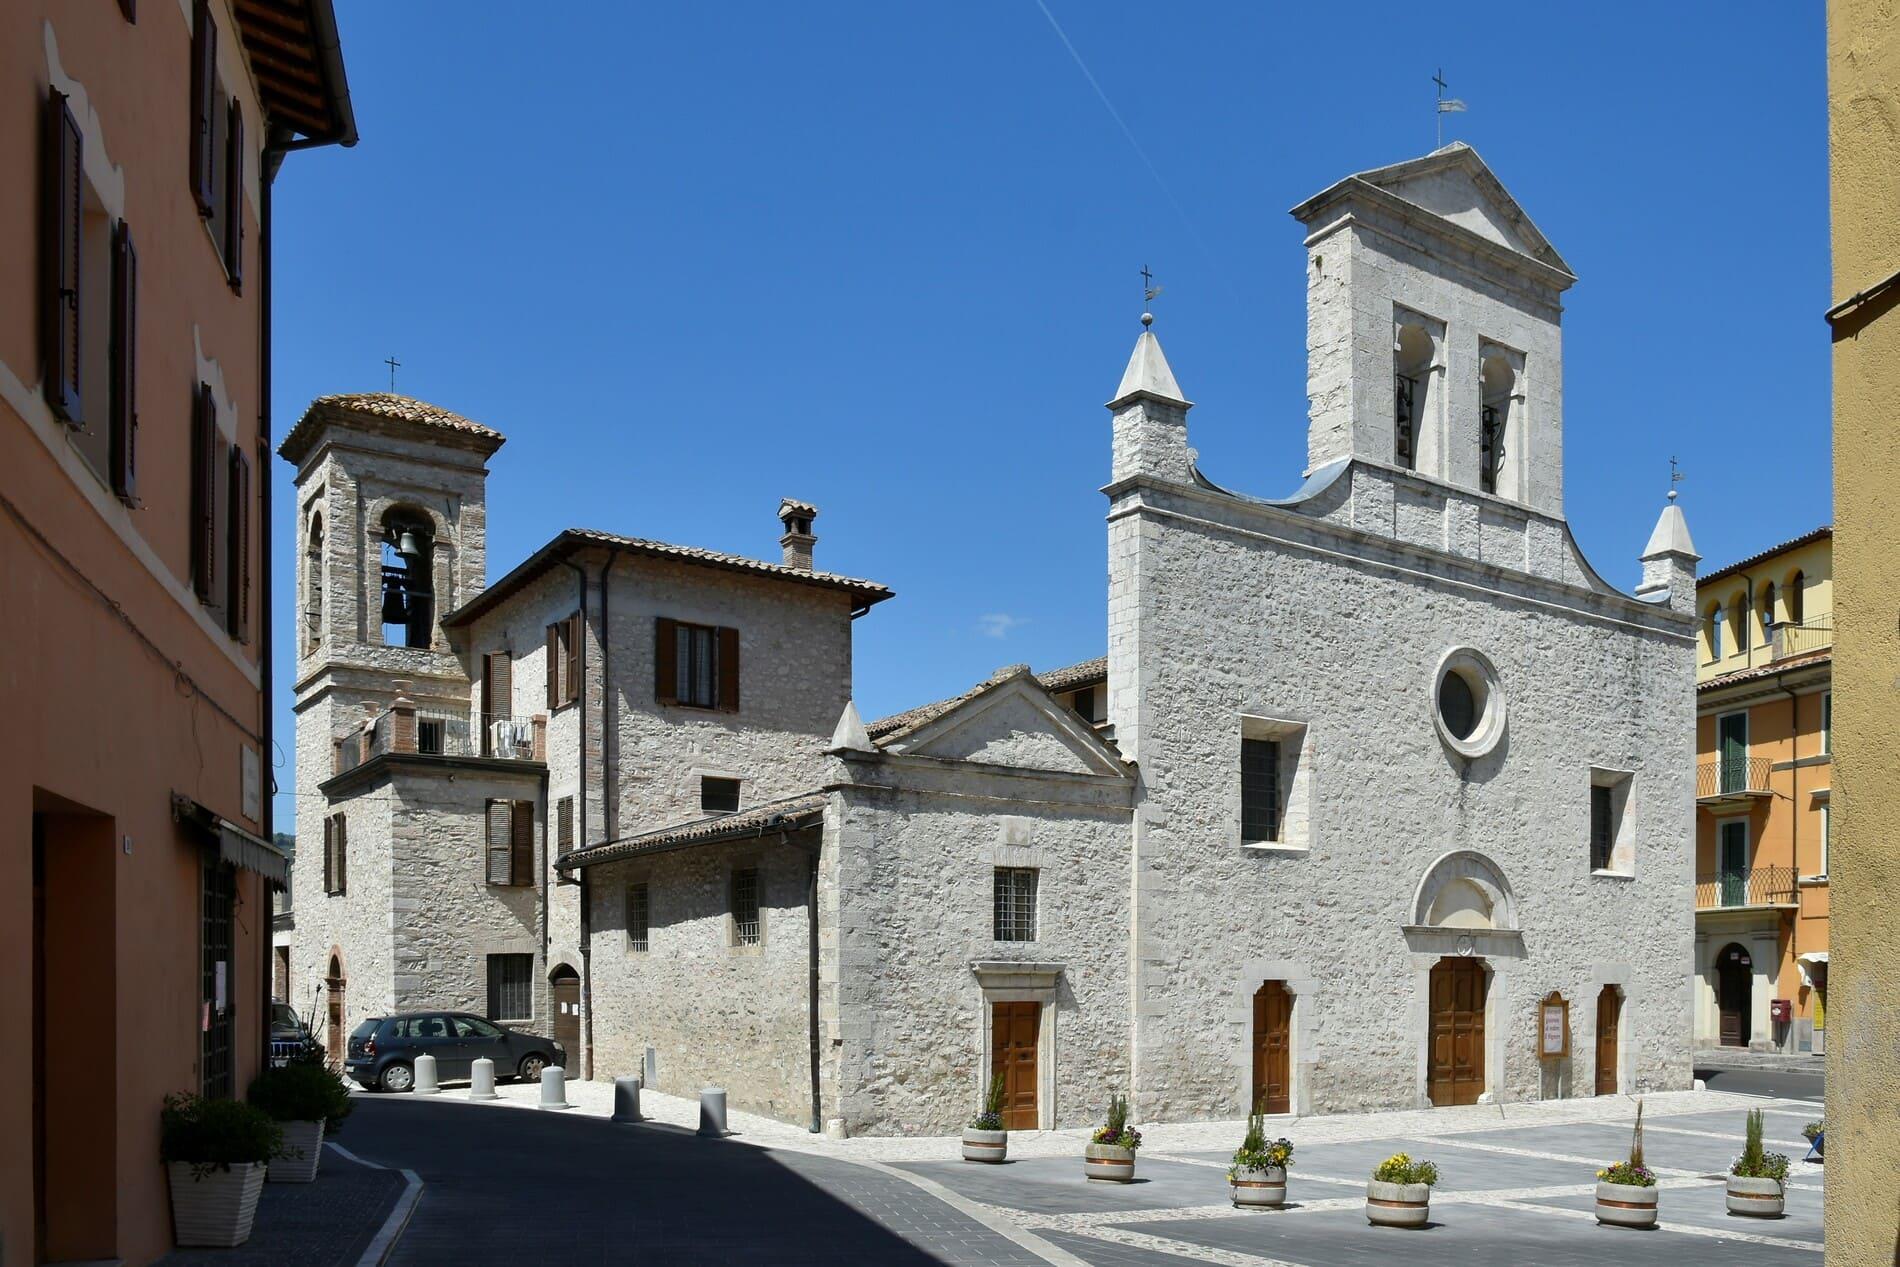 Piazza Garibaldi, Arrone